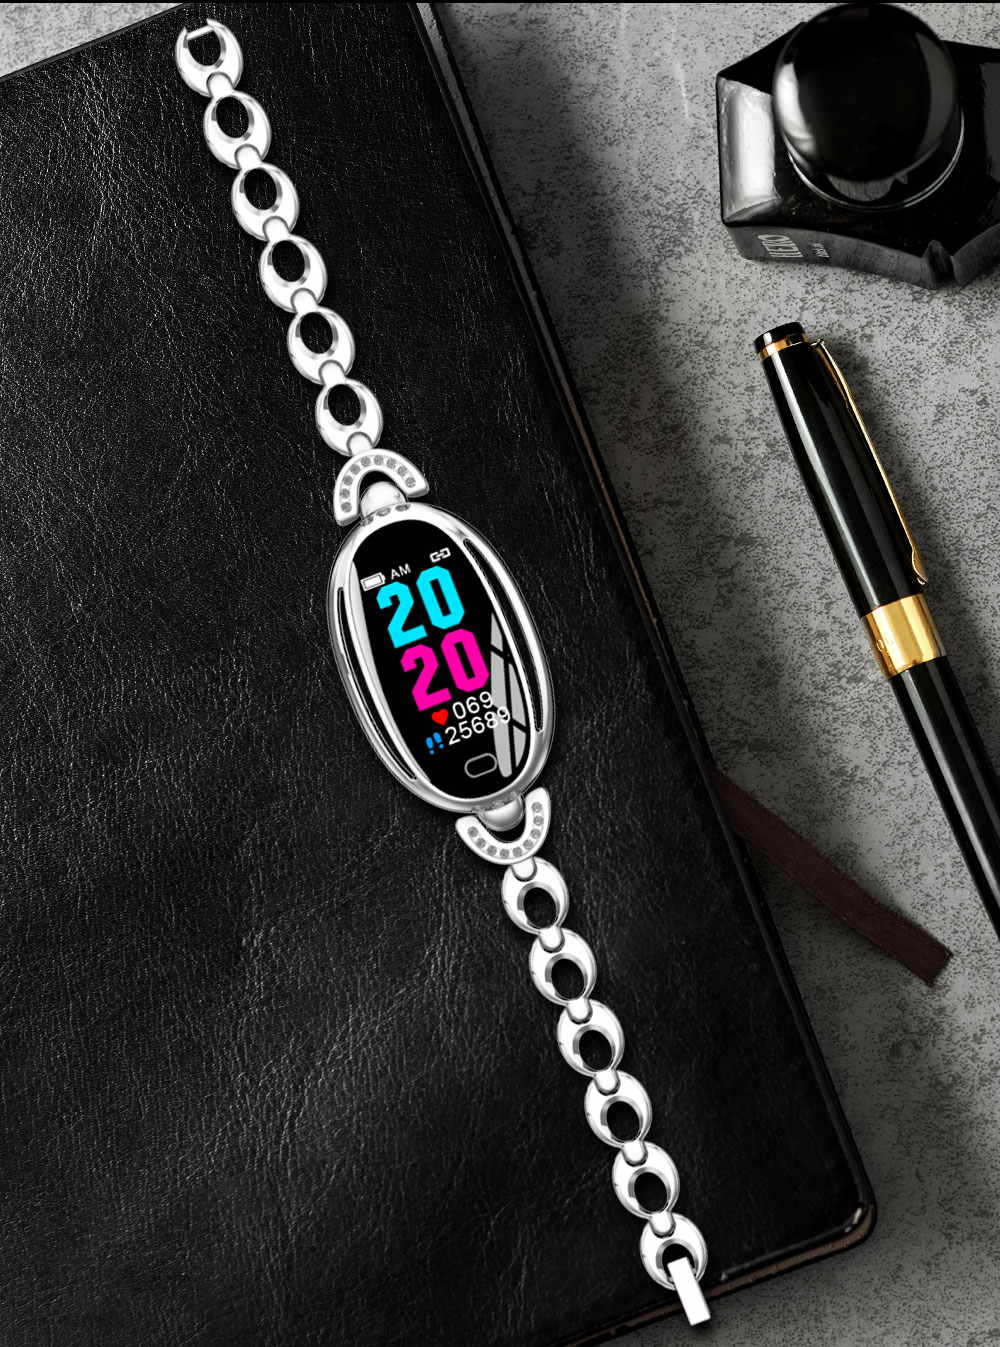 new e68 smart women bracelet